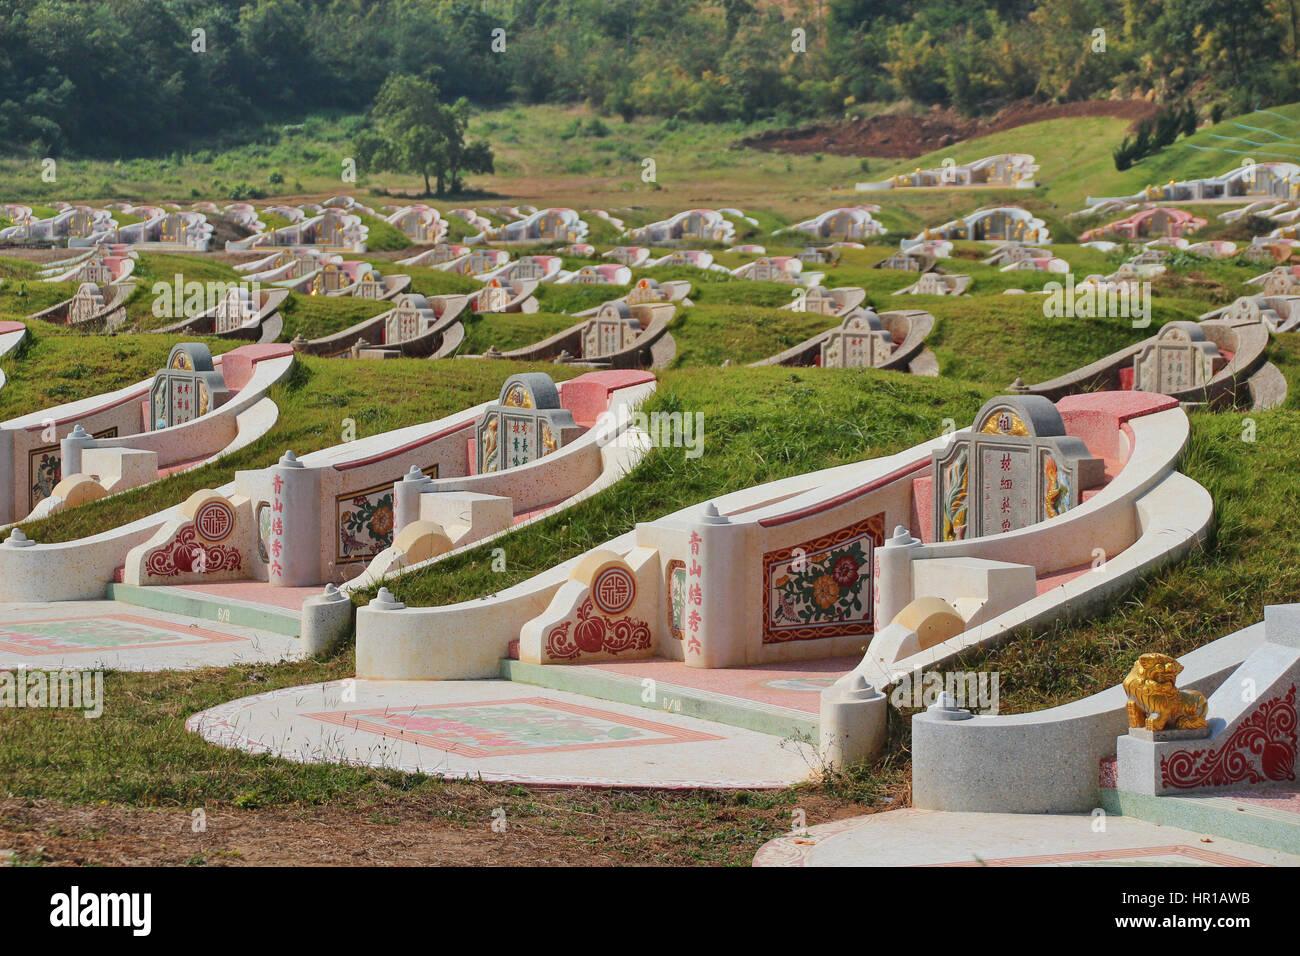 Tomba cinese - Fengshui in Thailandia Immagini Stock